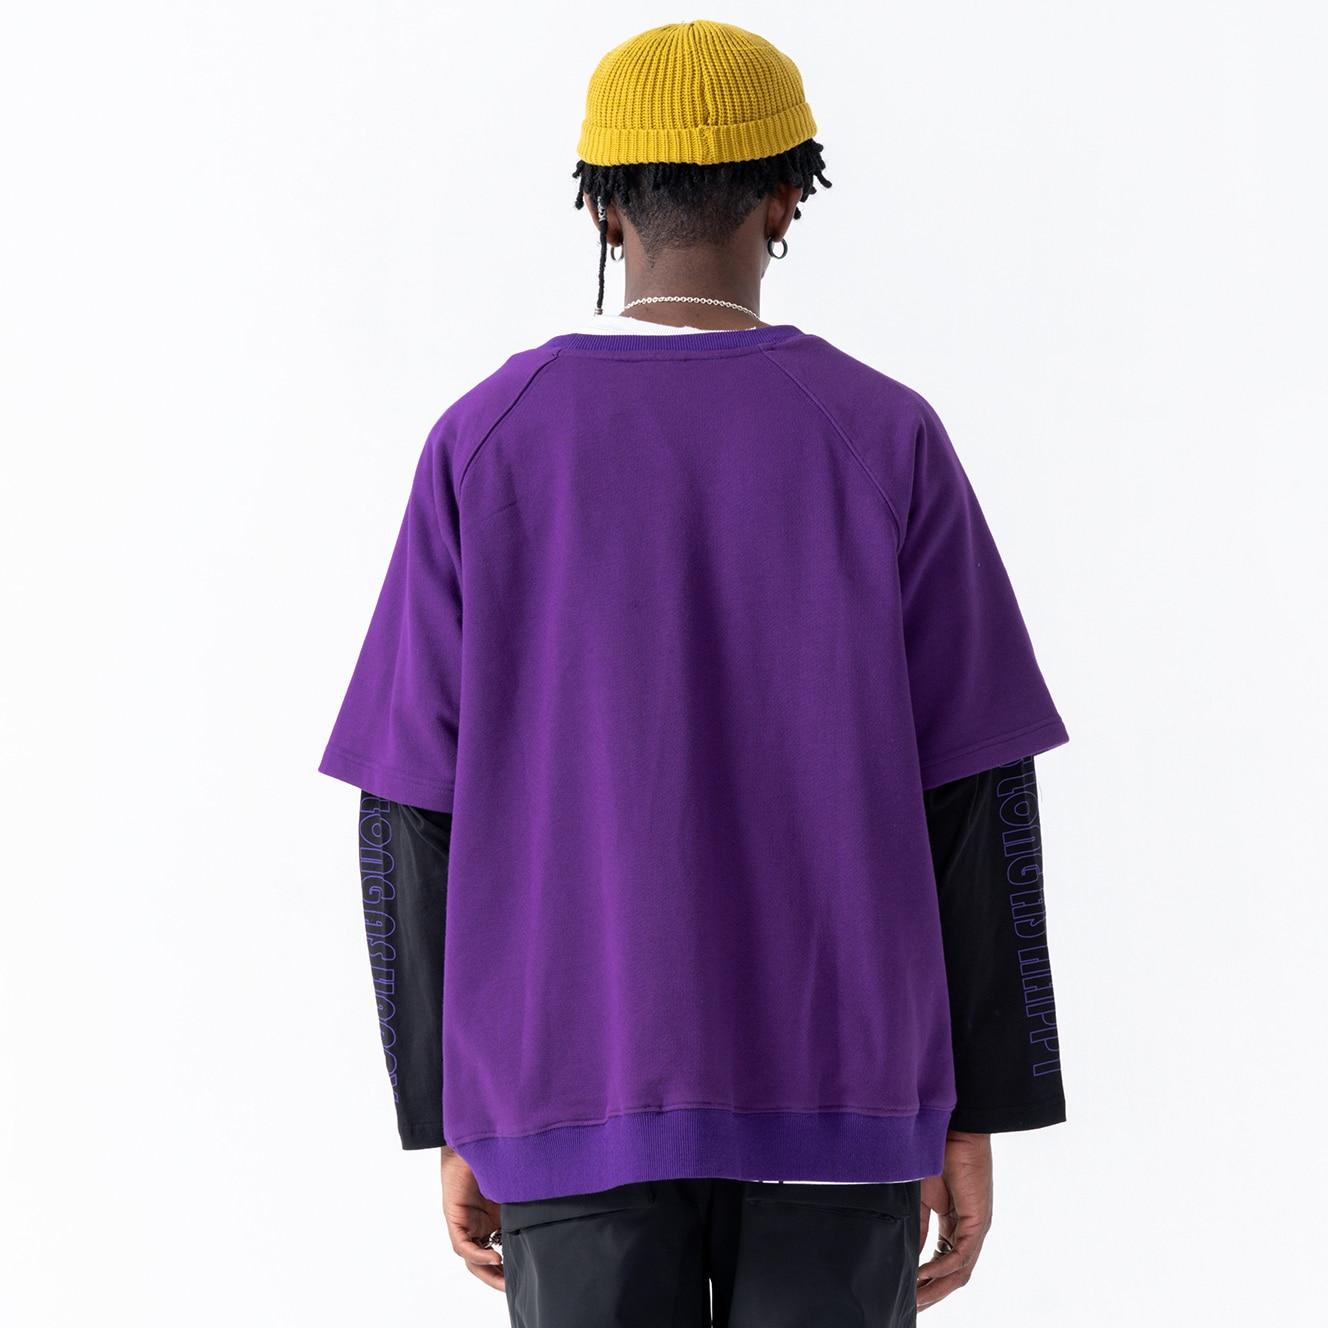 Marea Falsa Bordado De Marca Suelto Hop 2019 Hip Piezas Baile Negro Calle Dos Oscn7 W188 Sudadera Hombres púrpura Impreso dRnCdw